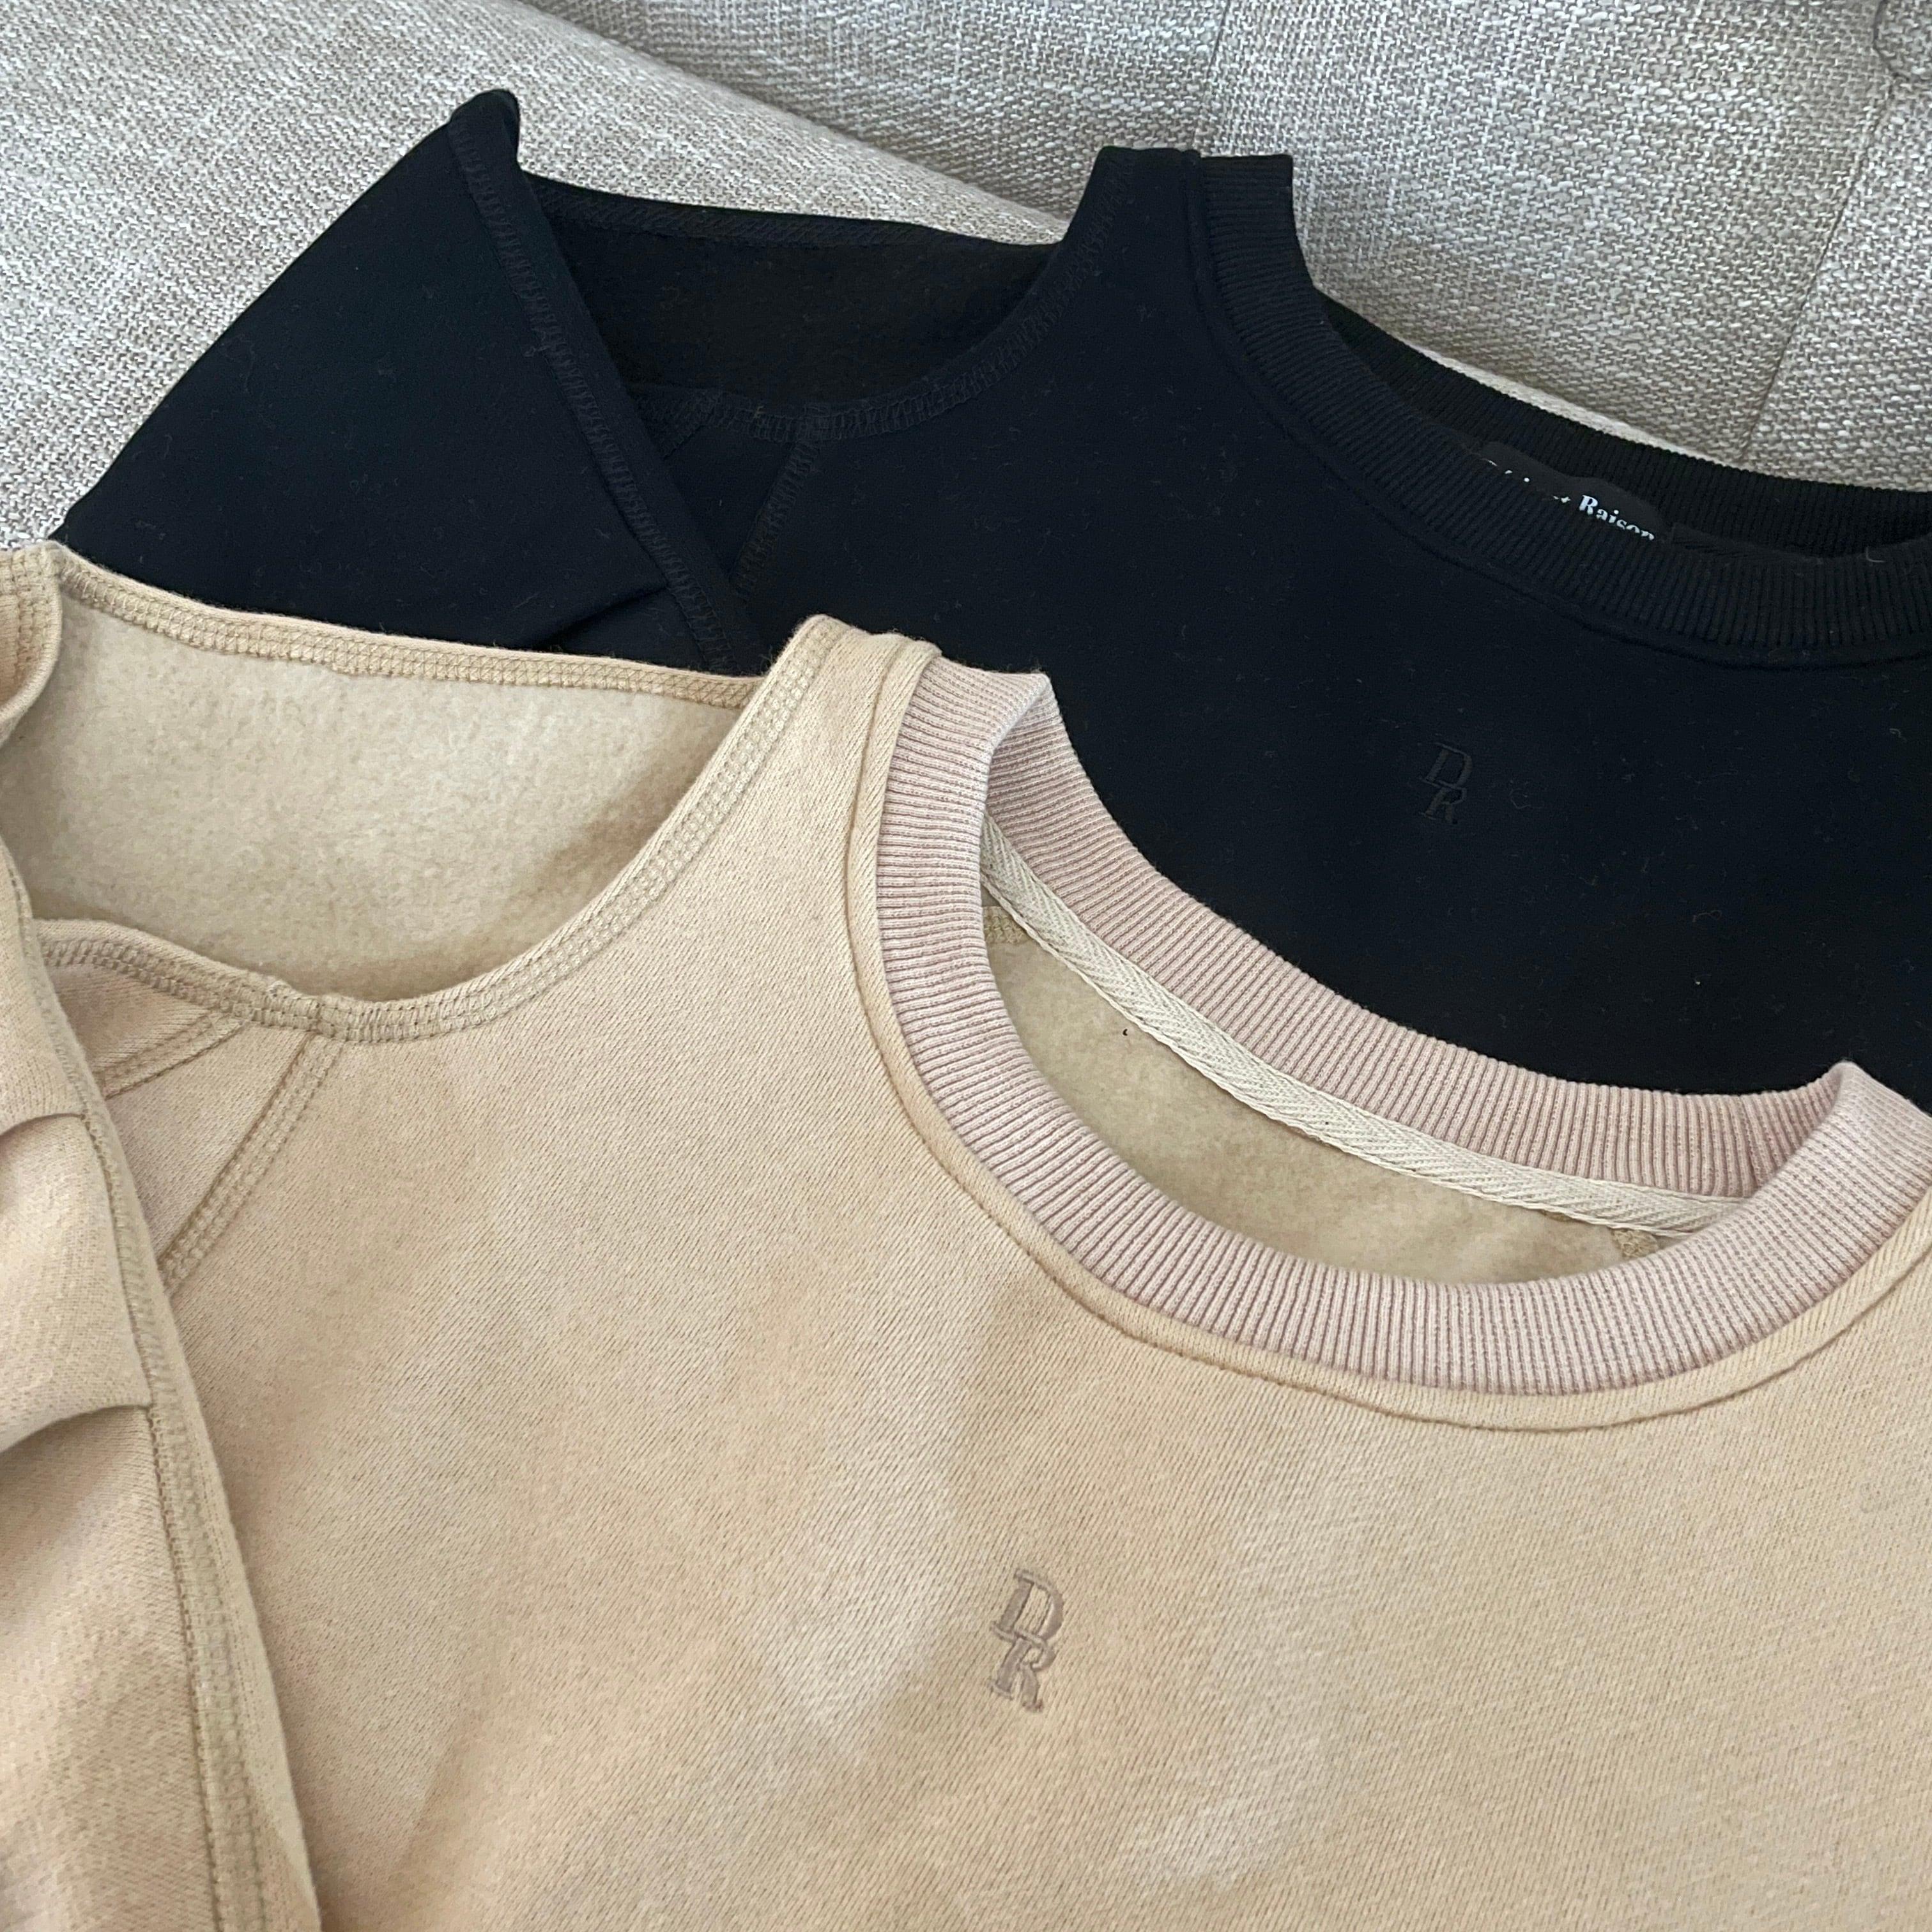 Désir original open shoulder sweatshirts